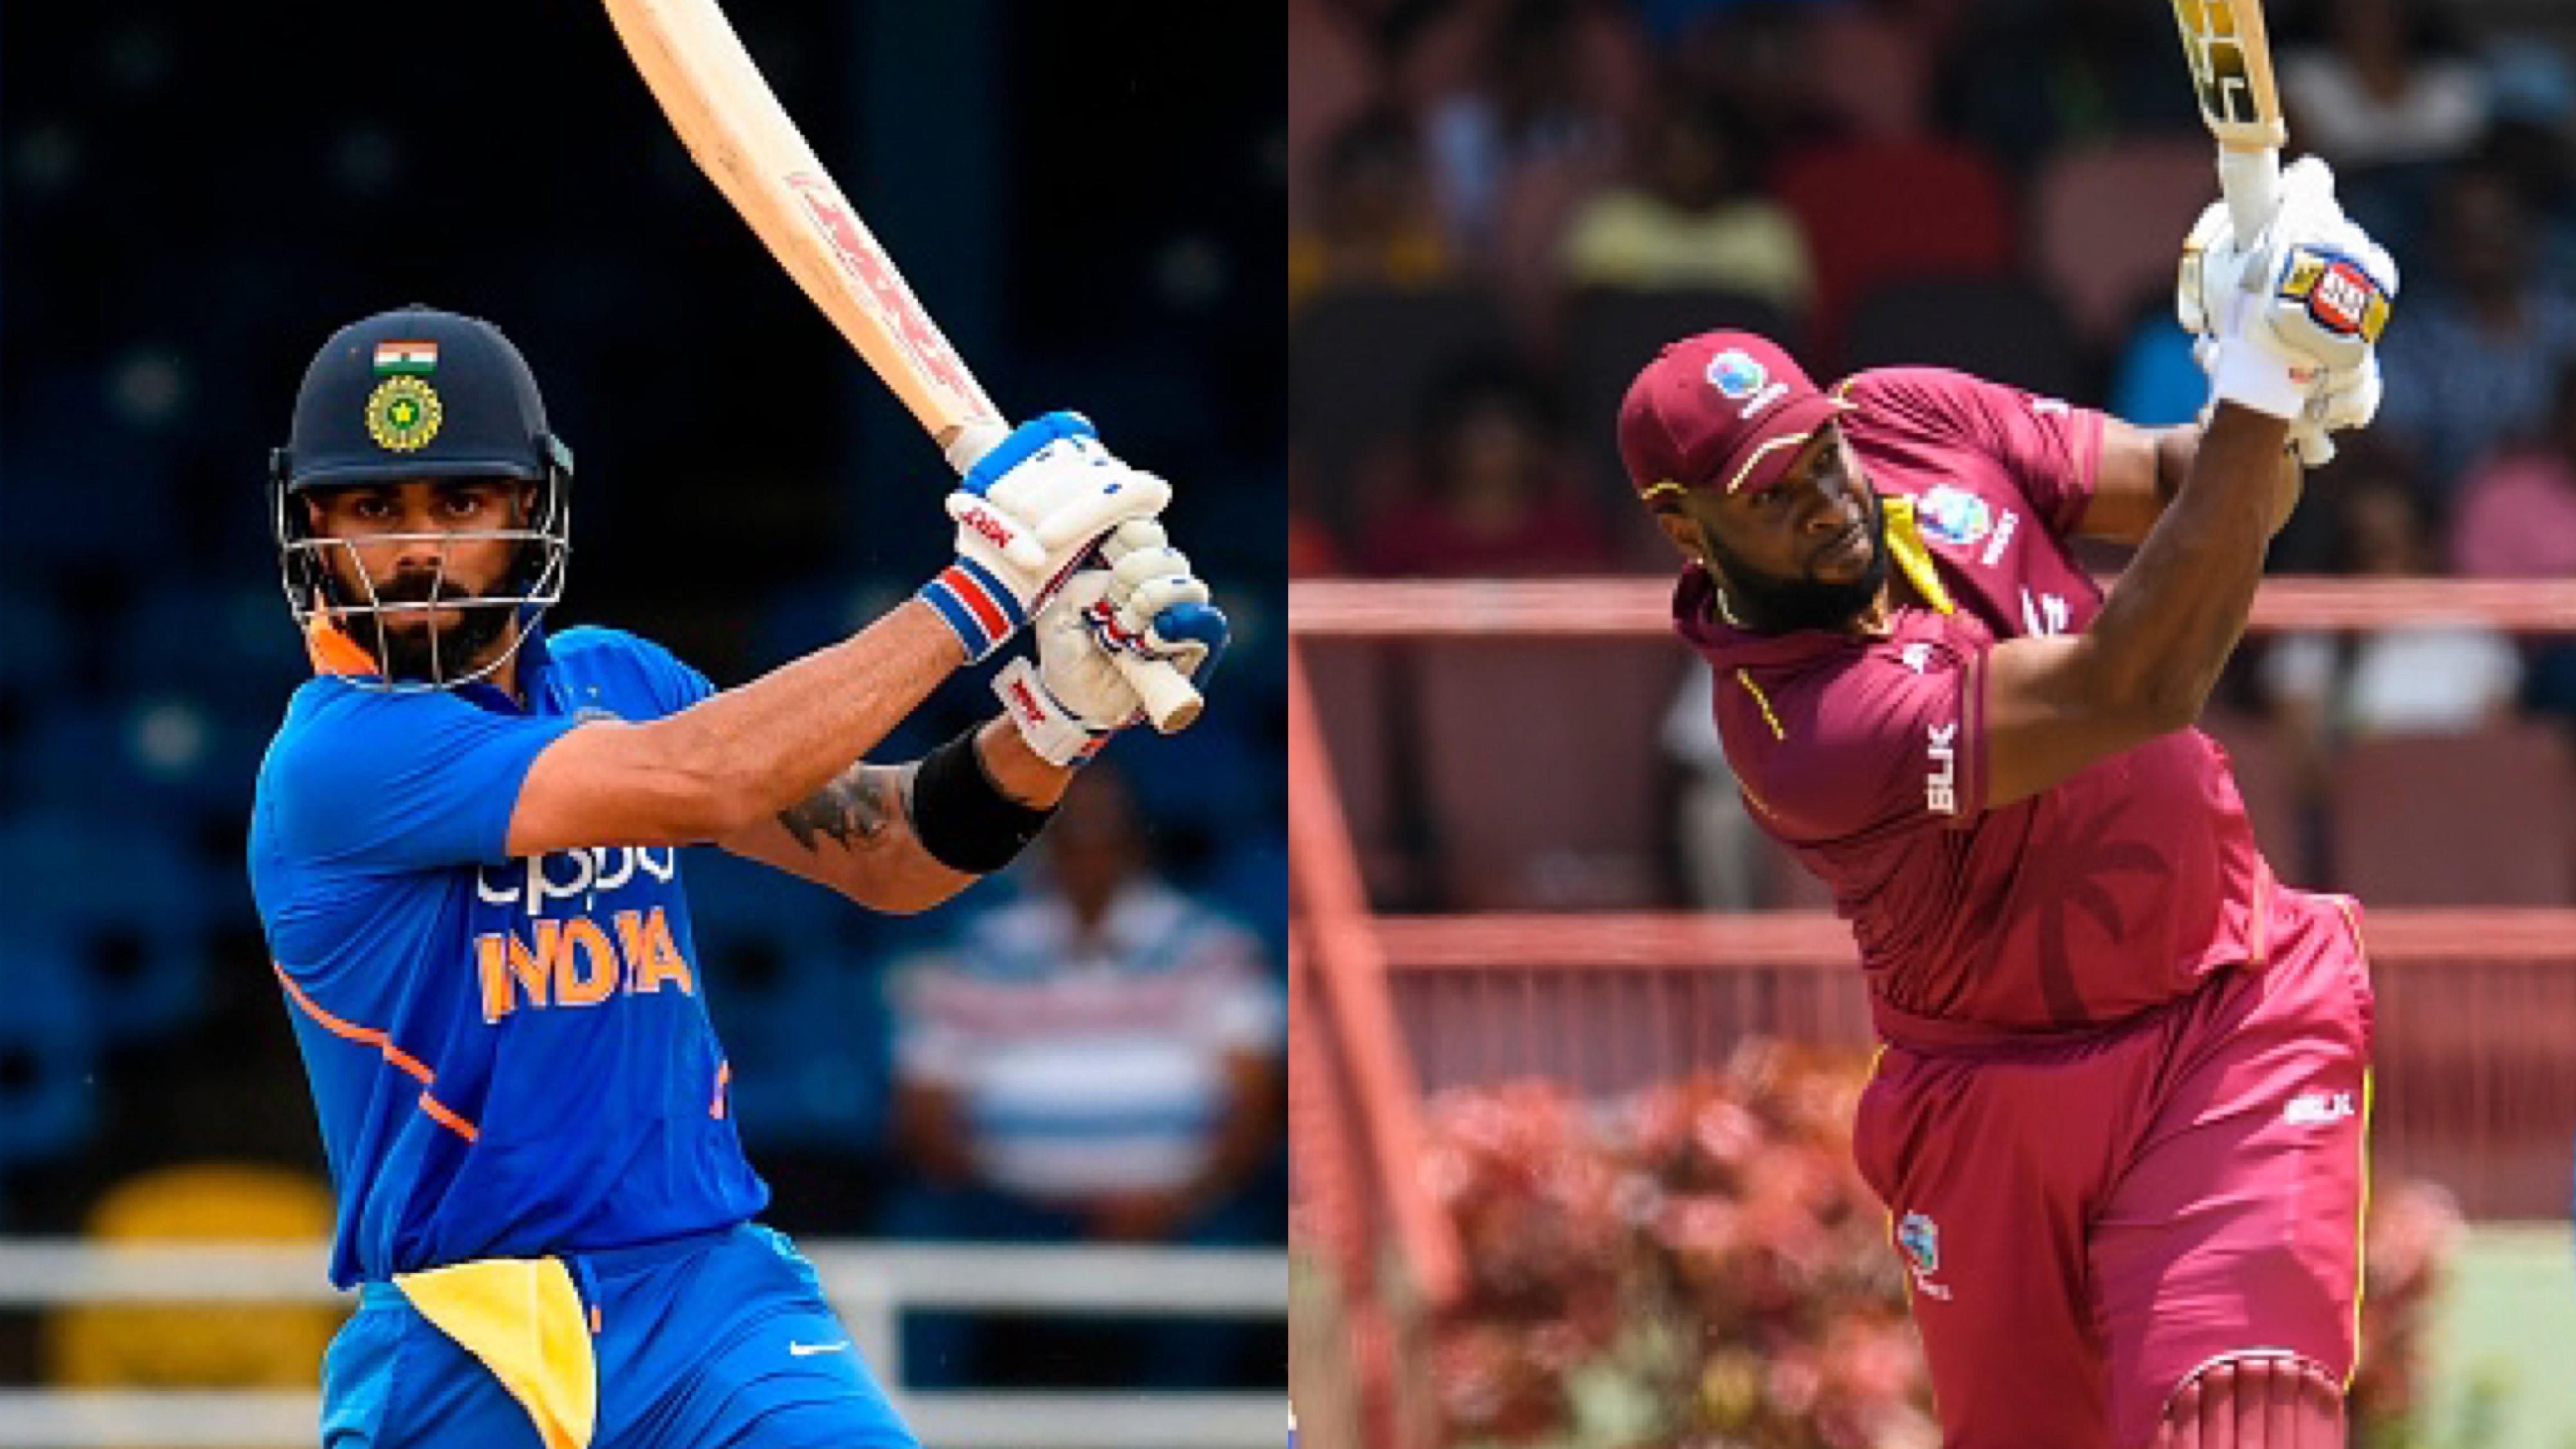 IND v WI 2019: First ODI - Statistical Preview